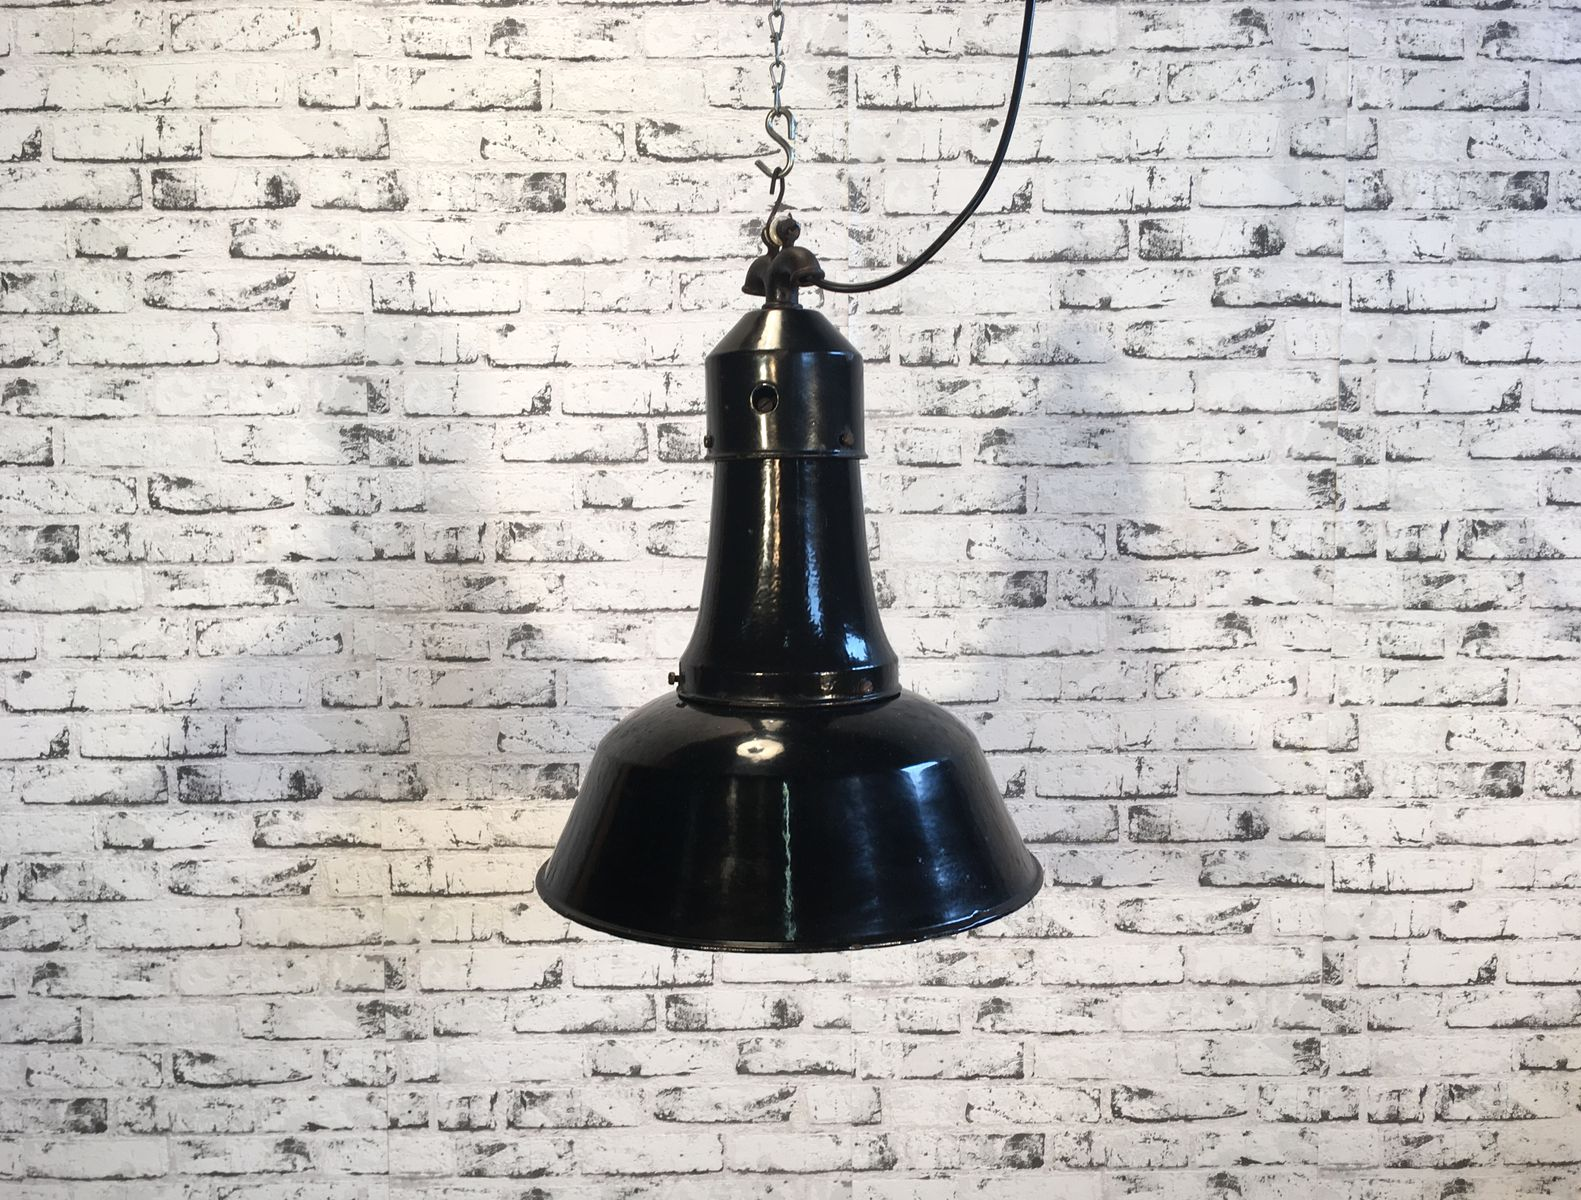 Industrielle schwarze emaillierte Lampe, 1920er